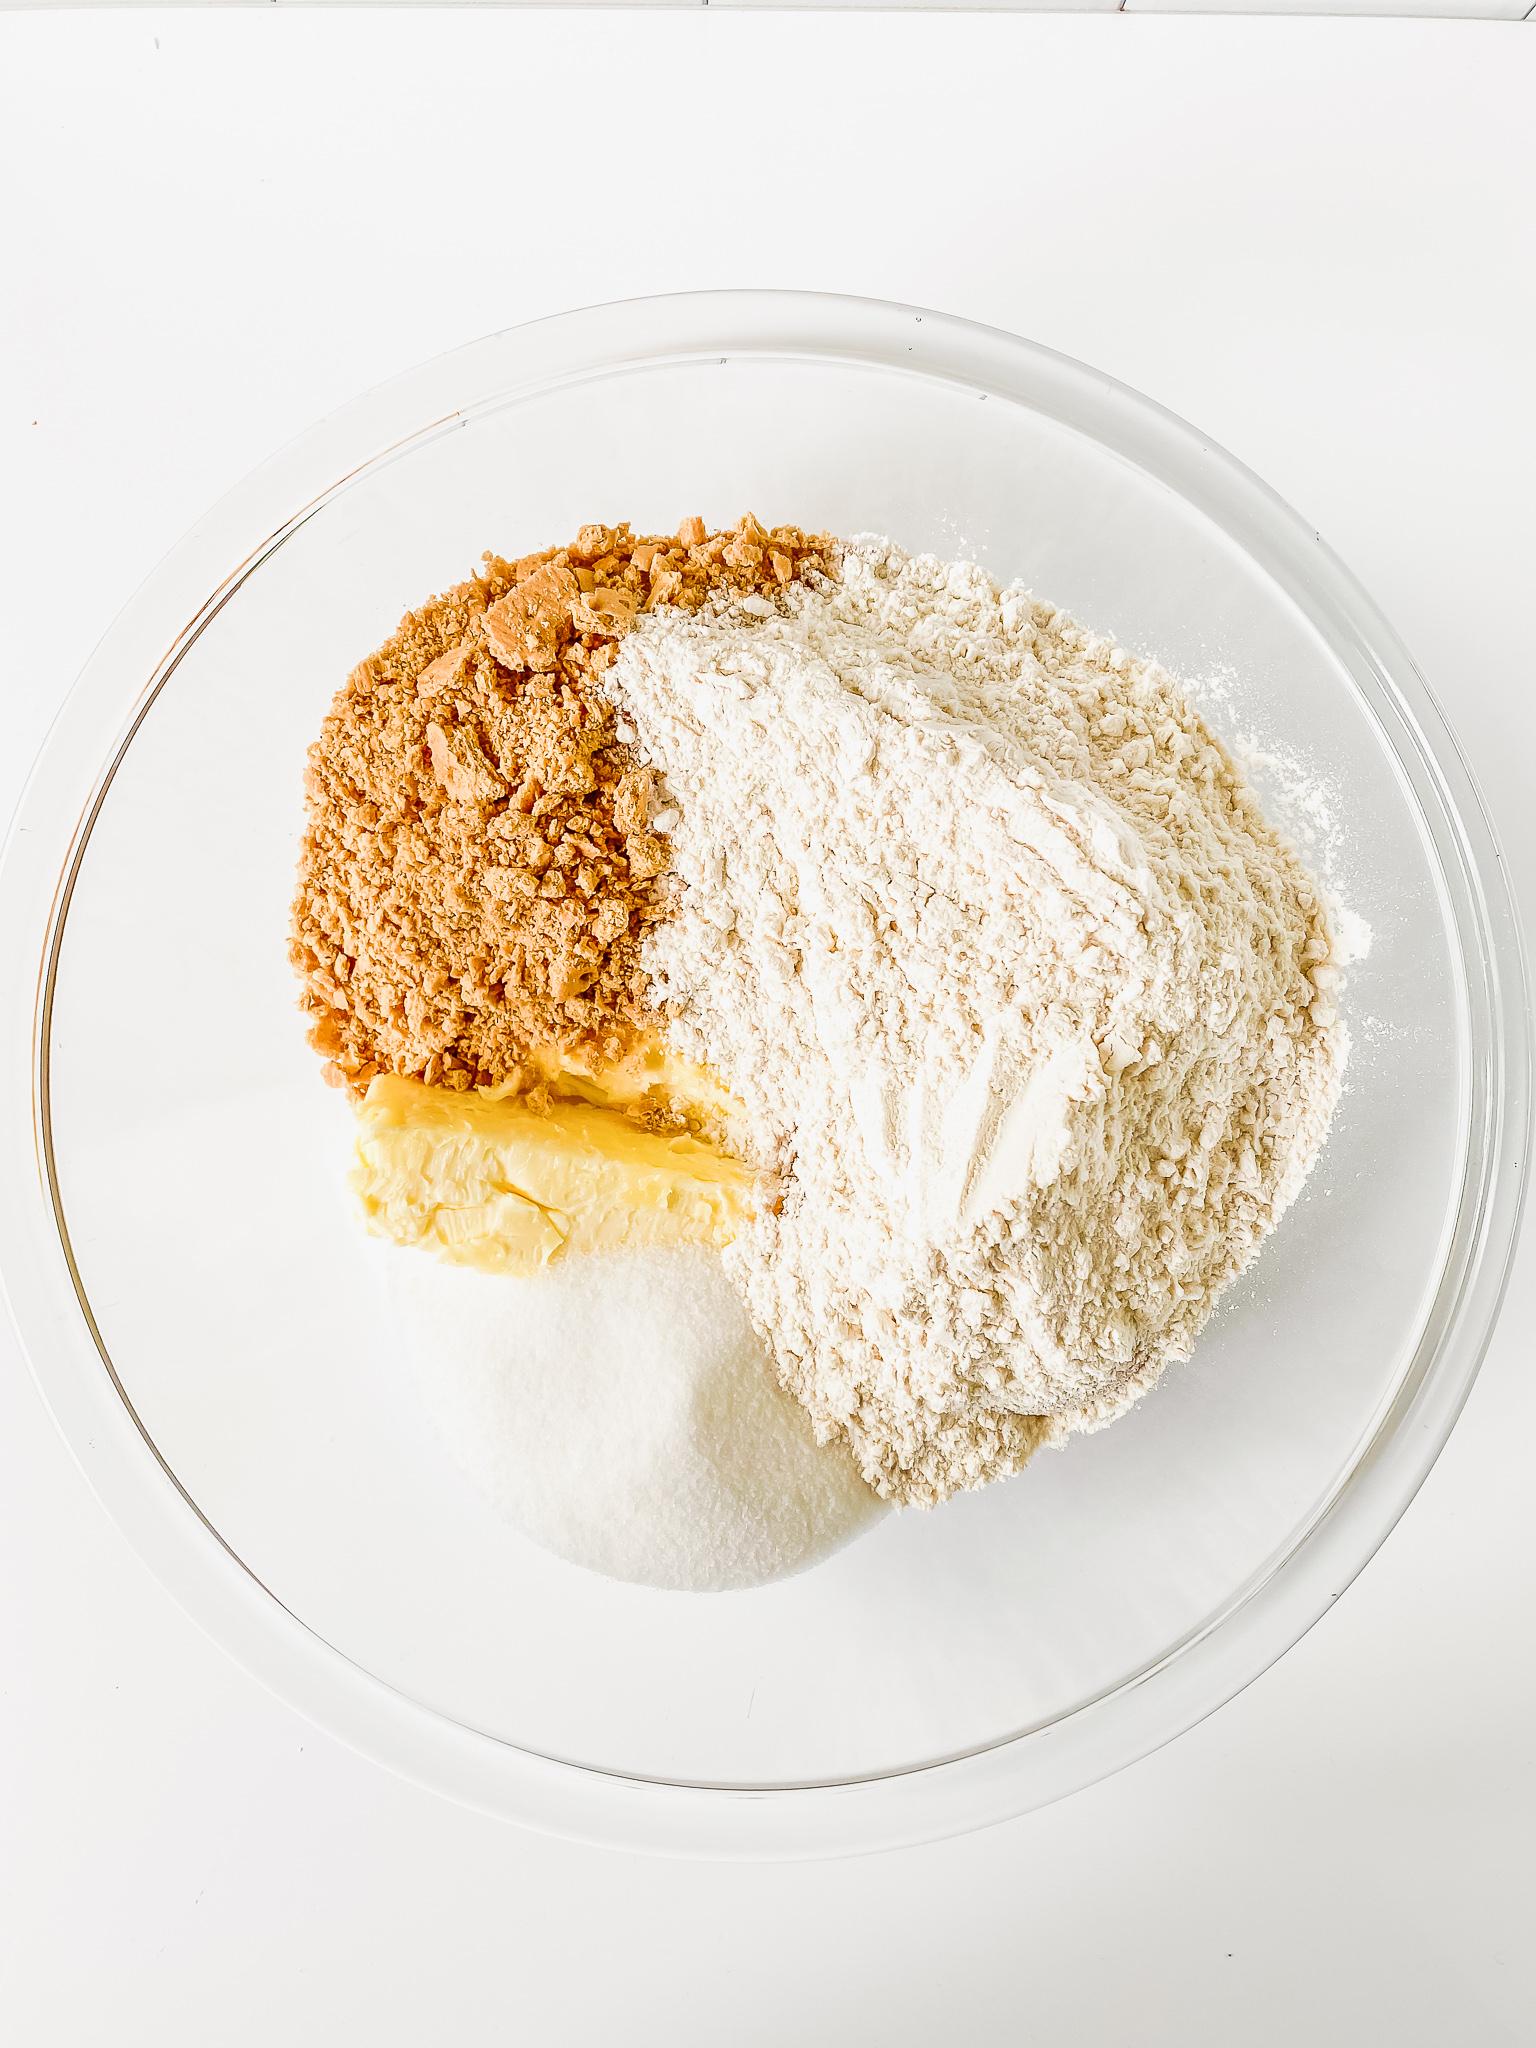 dry ingredients in bowl for lemon bars